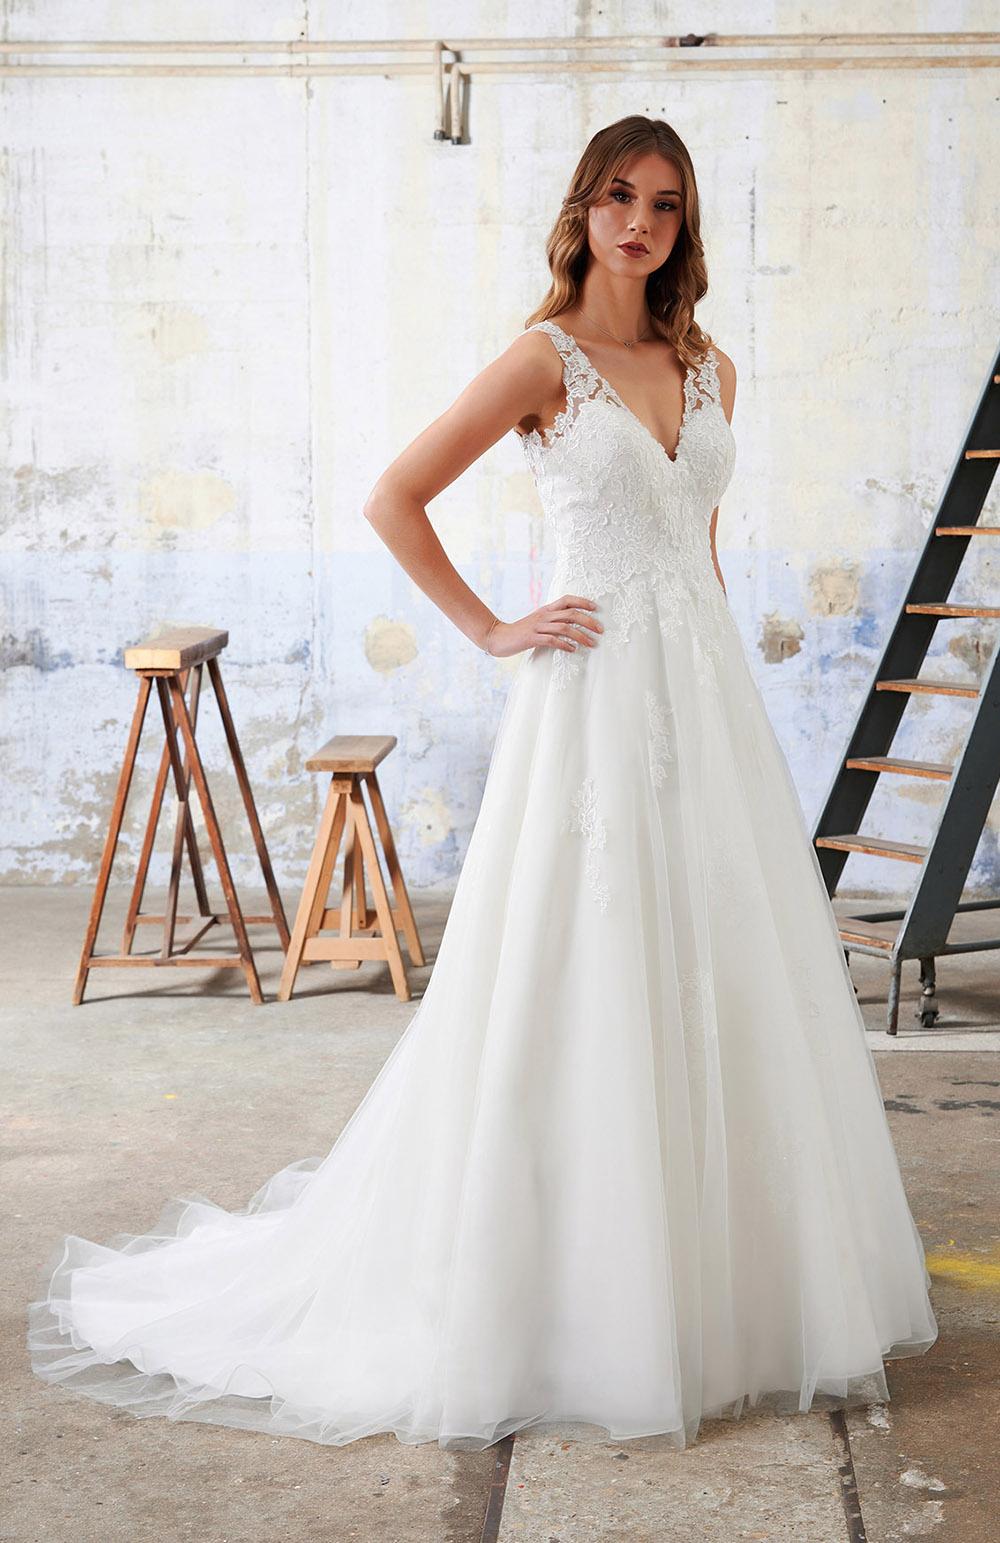 Robe de mariée Modèle Jina